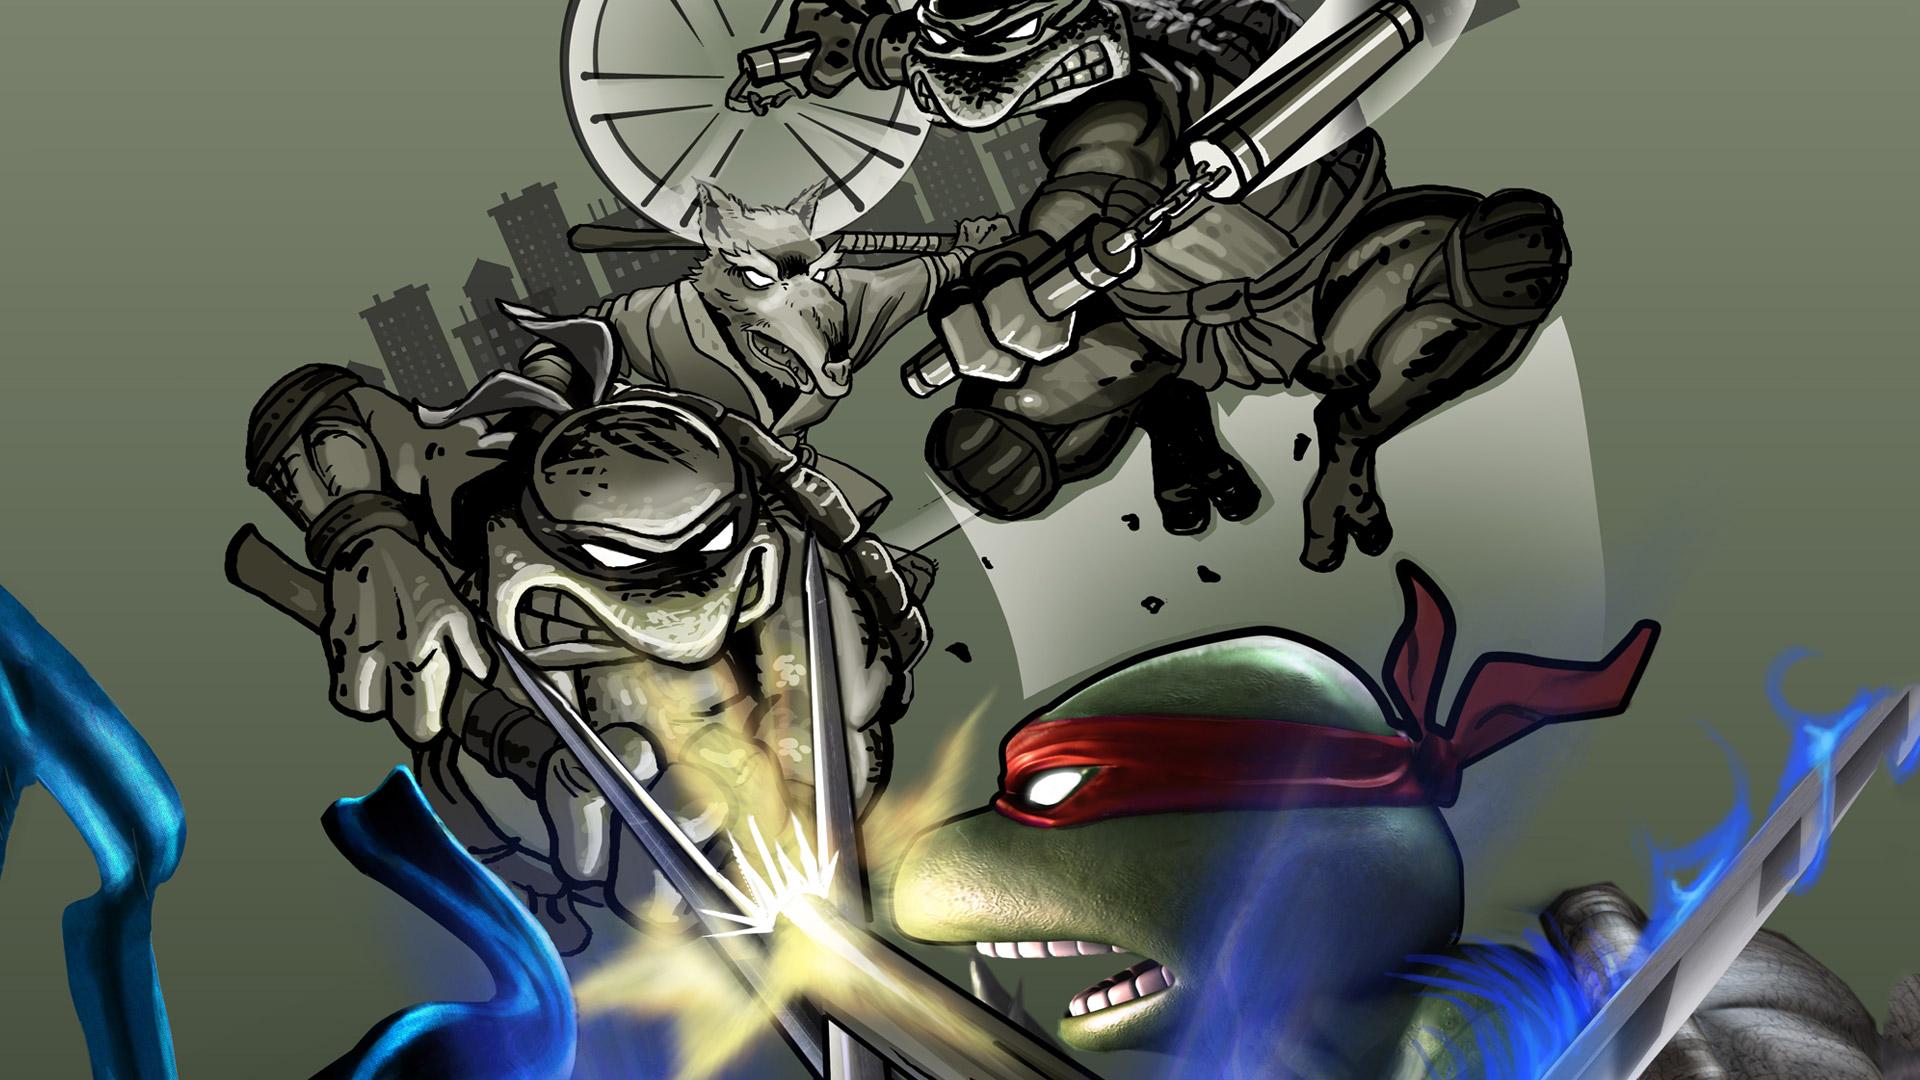 Free Teenage Mutant Ninja Turtles: Smash-Up Wallpaper in 1920x1080